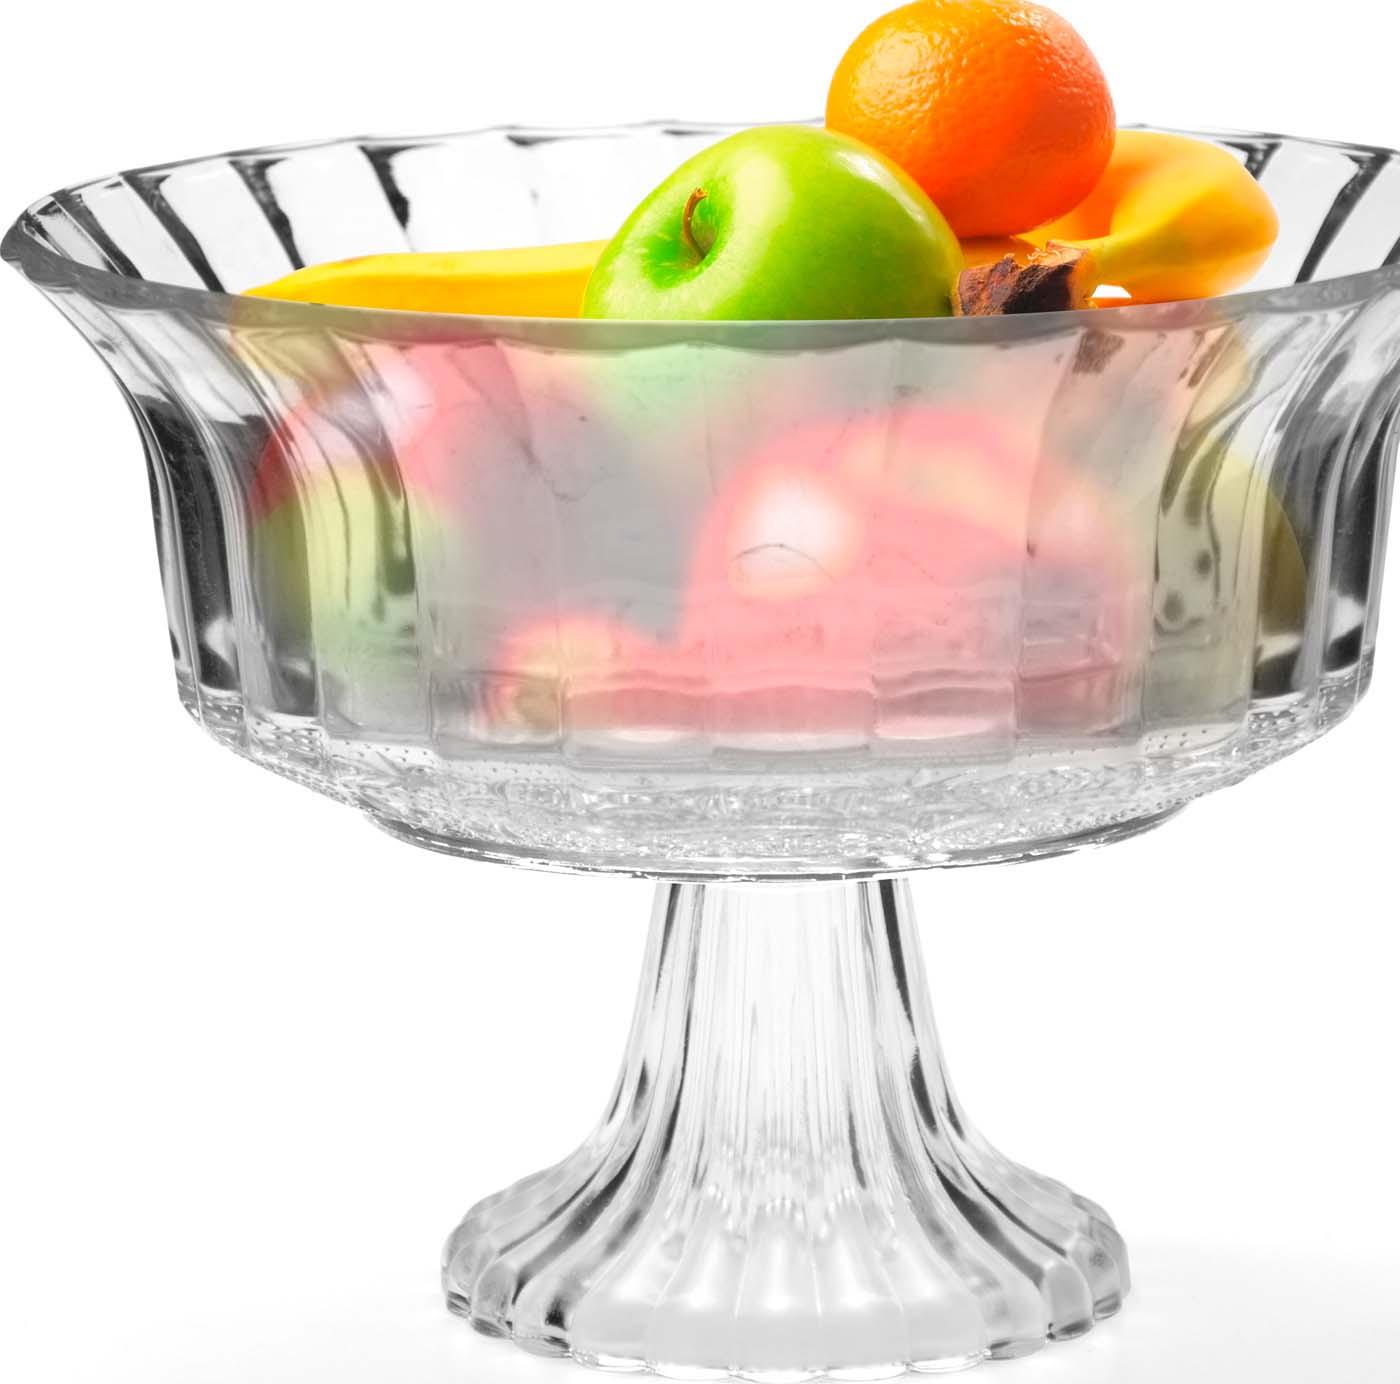 Ваза для фруктов Mayer & Boch, цвет: прозрачный, 22,5 х 16,5 см